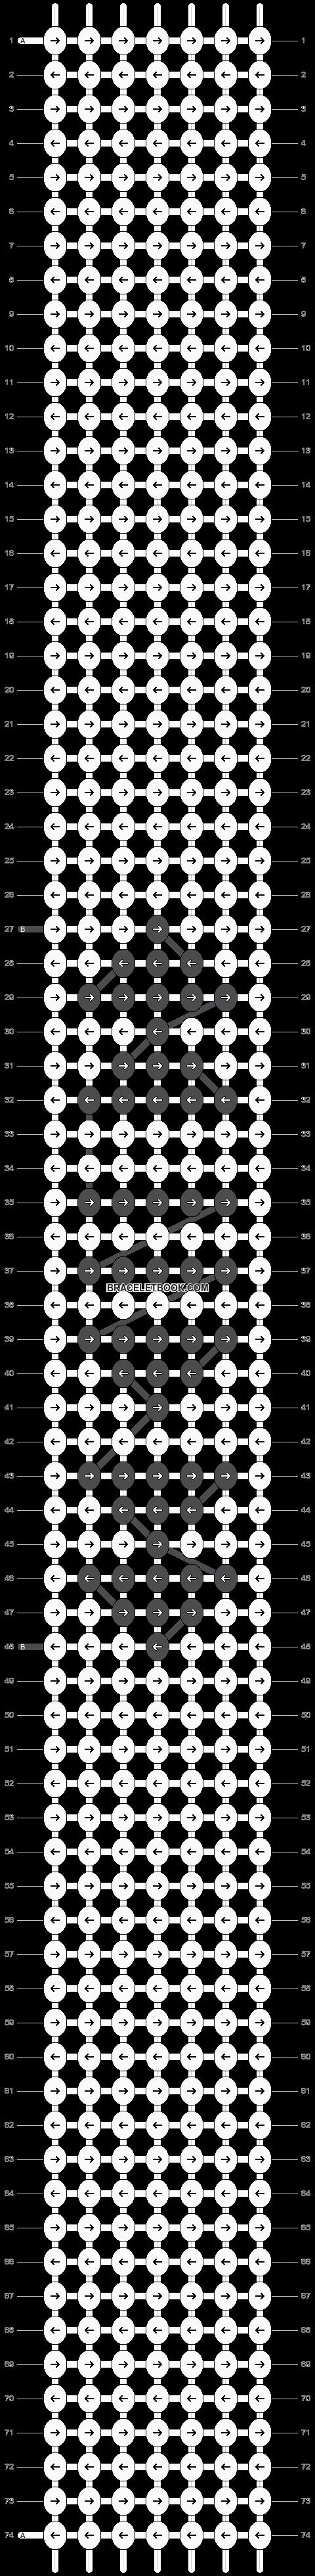 Alpha pattern #17341 pattern